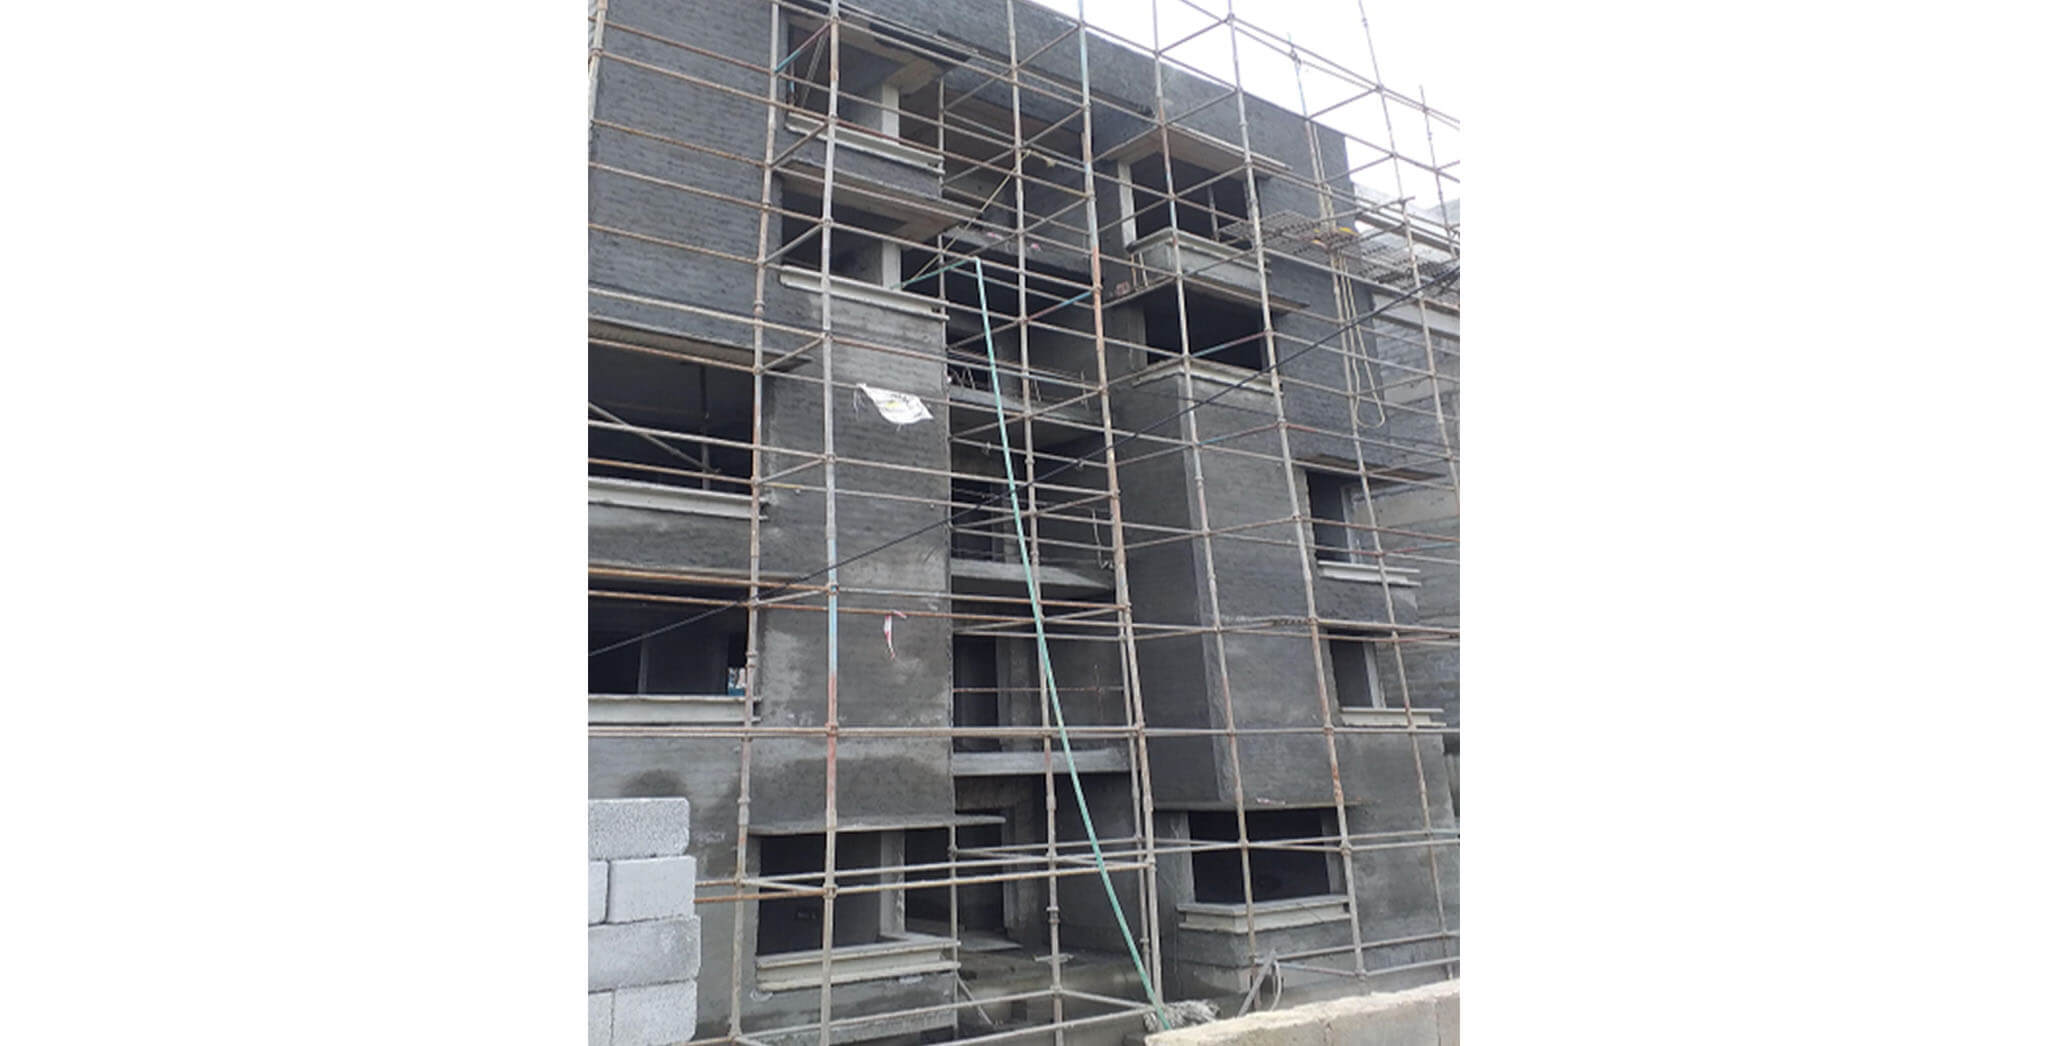 Oct 2020 - South side view: E Block—External plastering work-in-progress